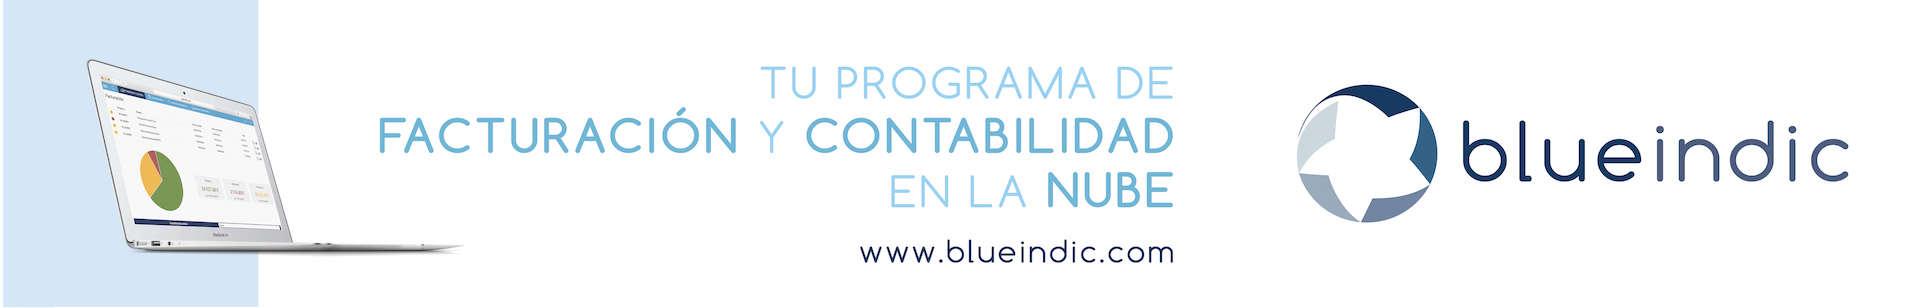 Blueindic